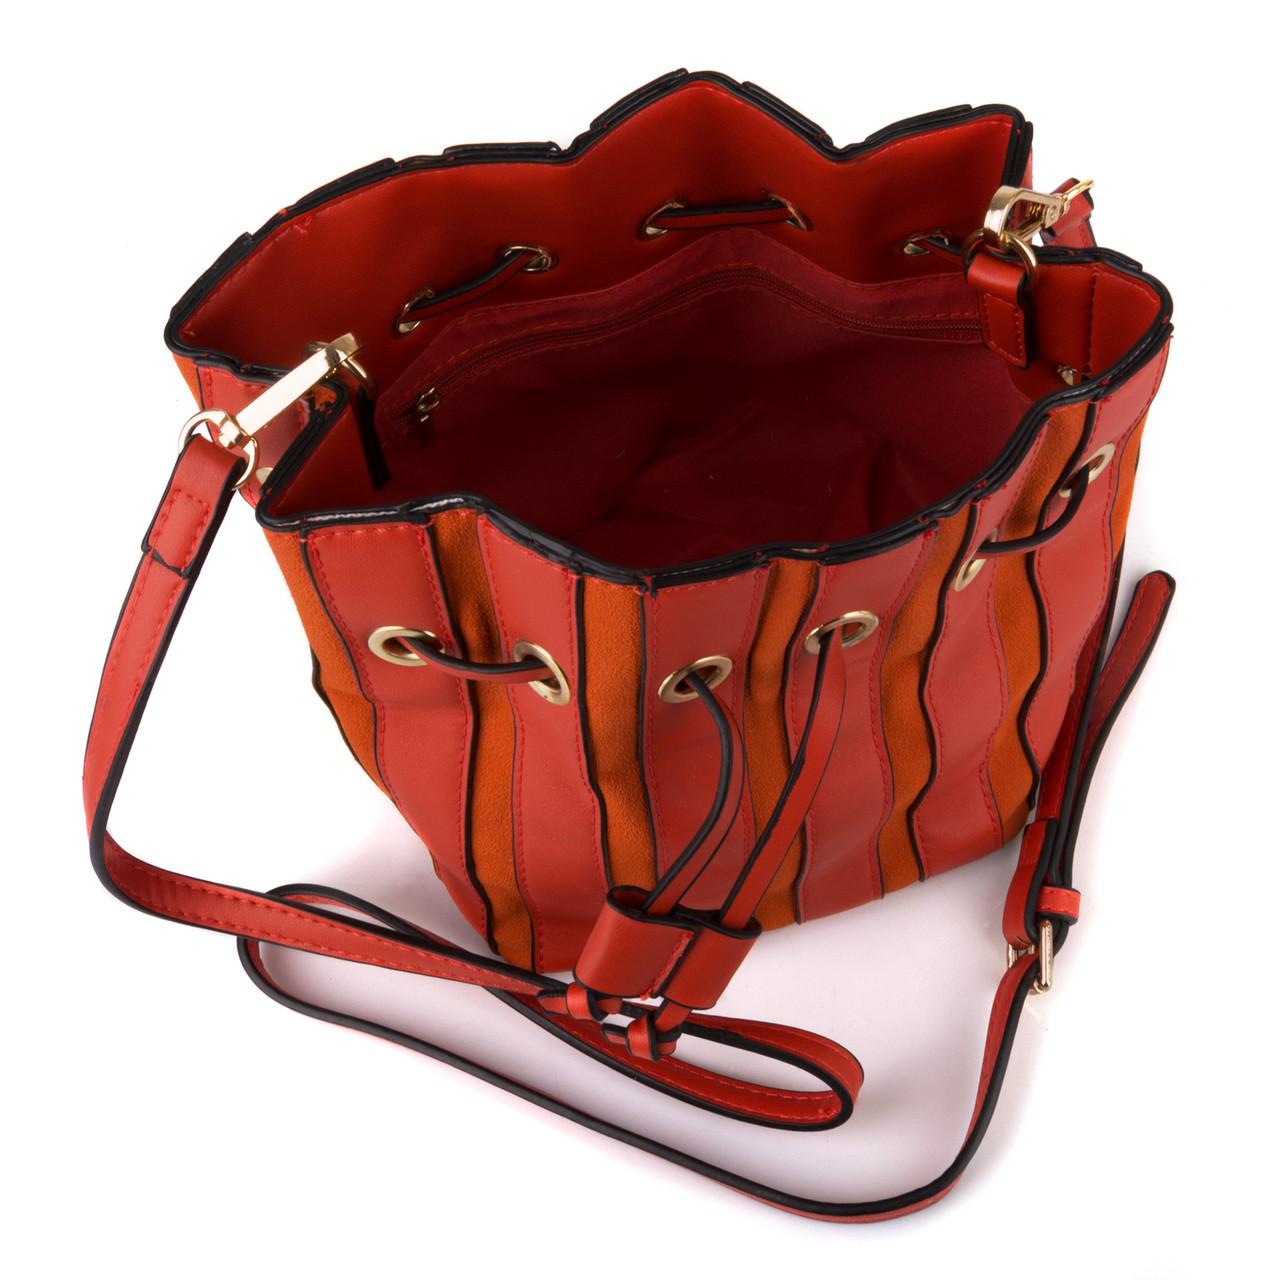 17365fa2 Женская Сумка - Мешок на кулиске Kafa 001 оранжевая: продажа, цена в ...